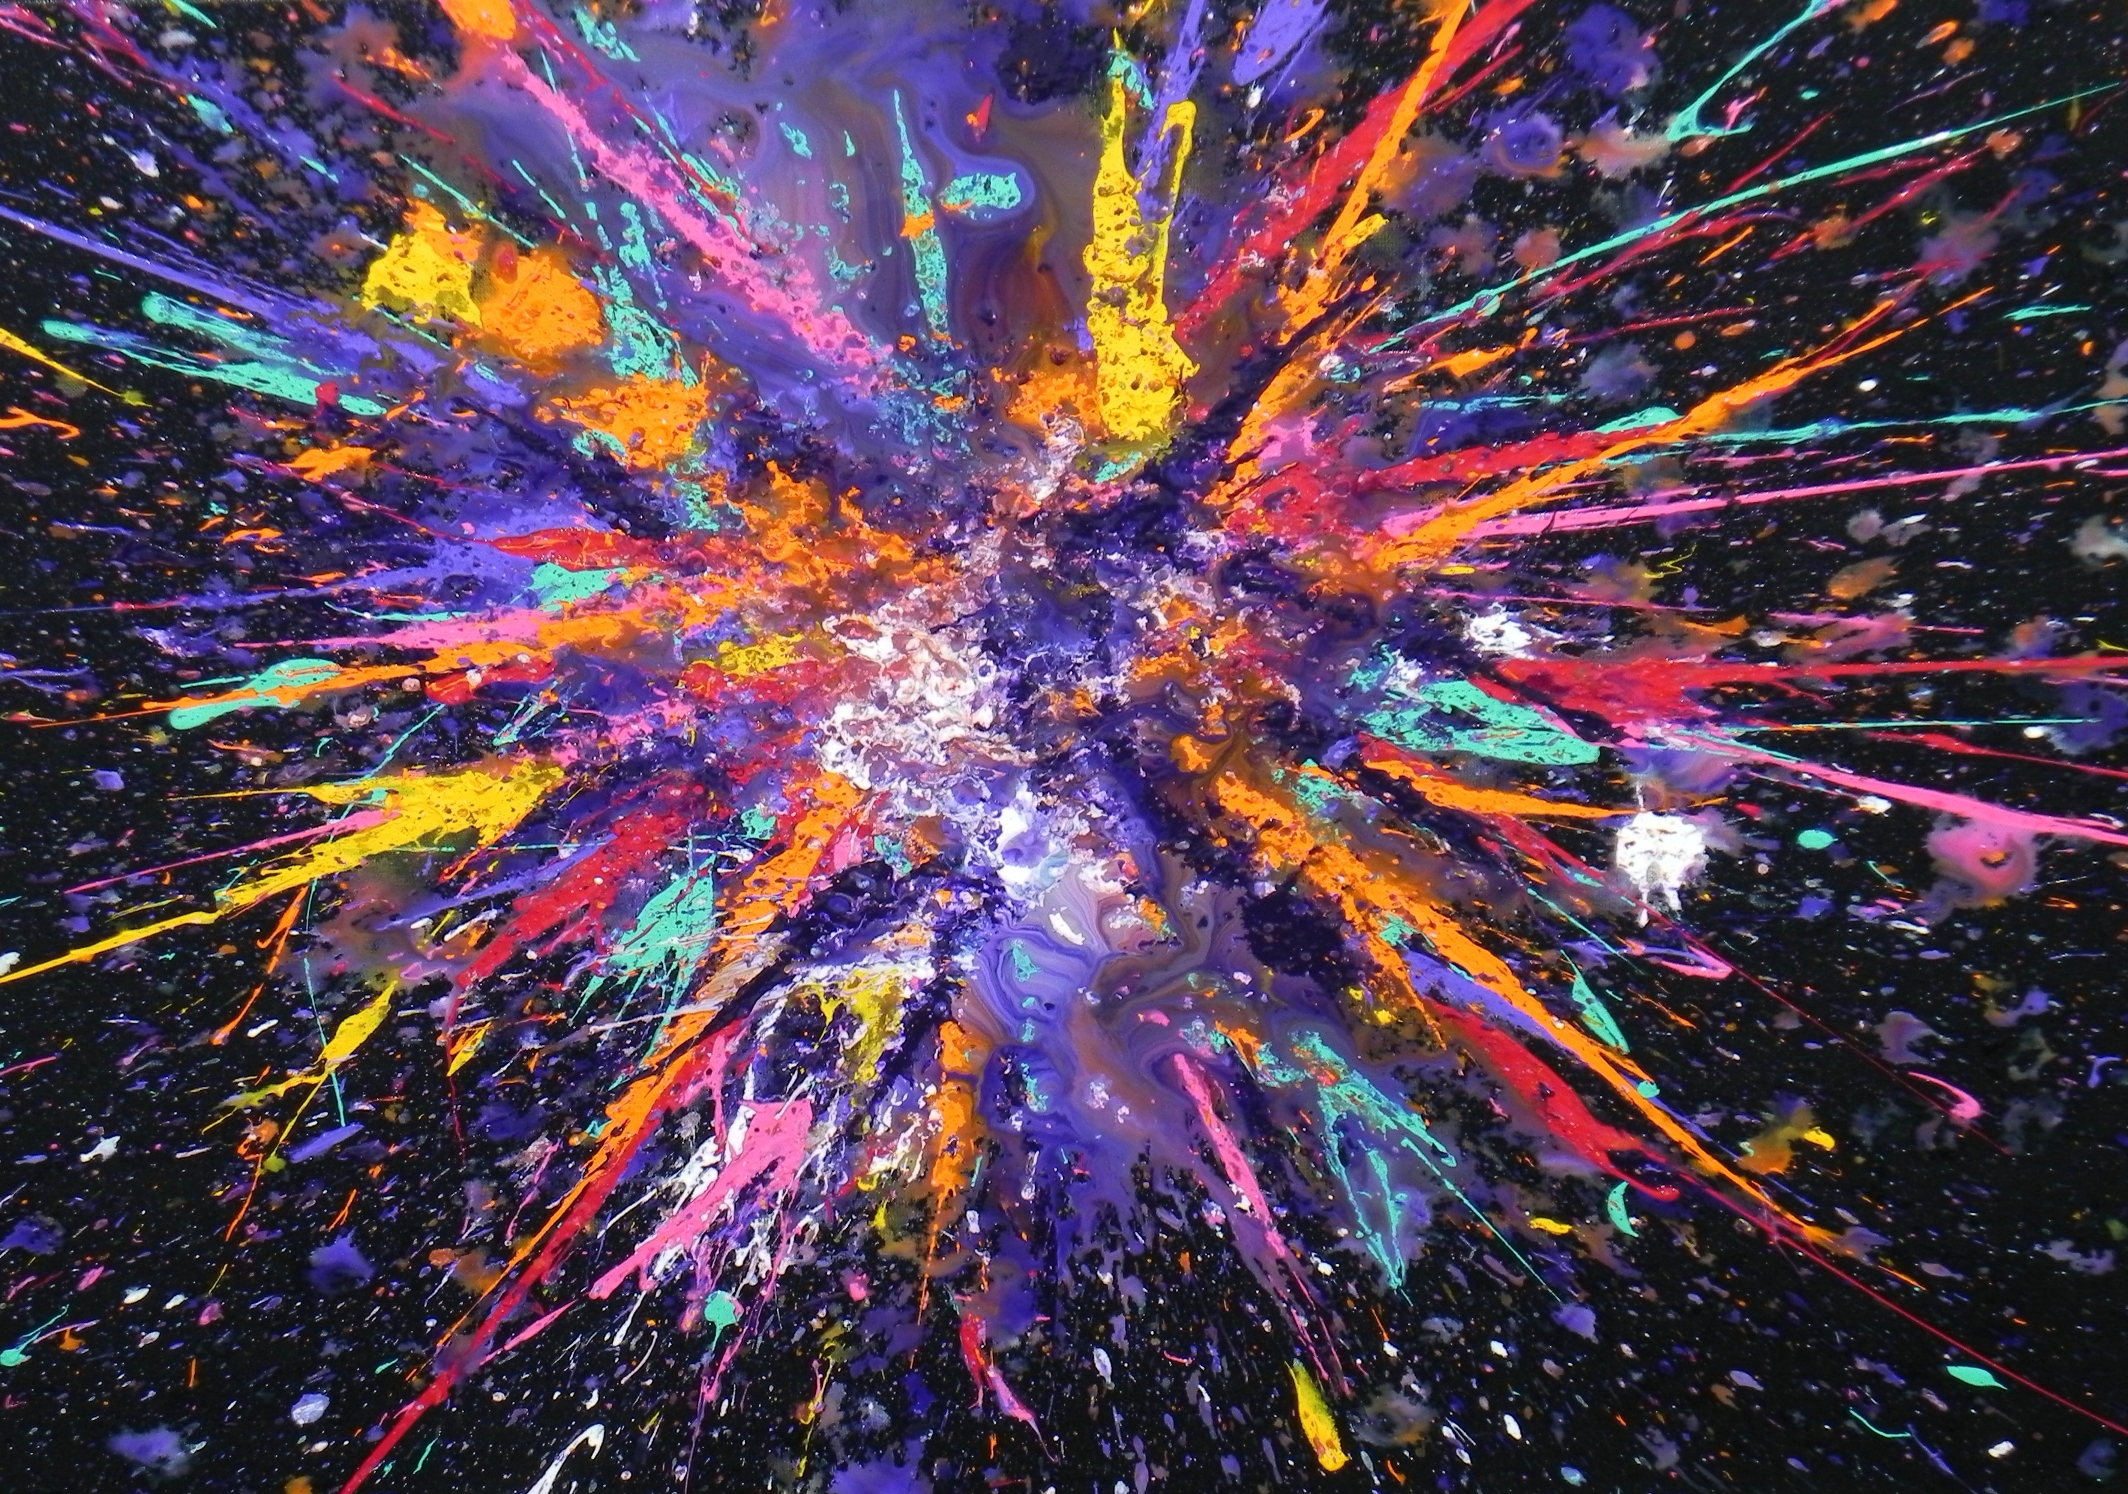 Aline_PASCHOLATI,_Explosão_II,_acrílico_sobre_tela,_50X60cm,_2012._(2)_-_Cópia.j